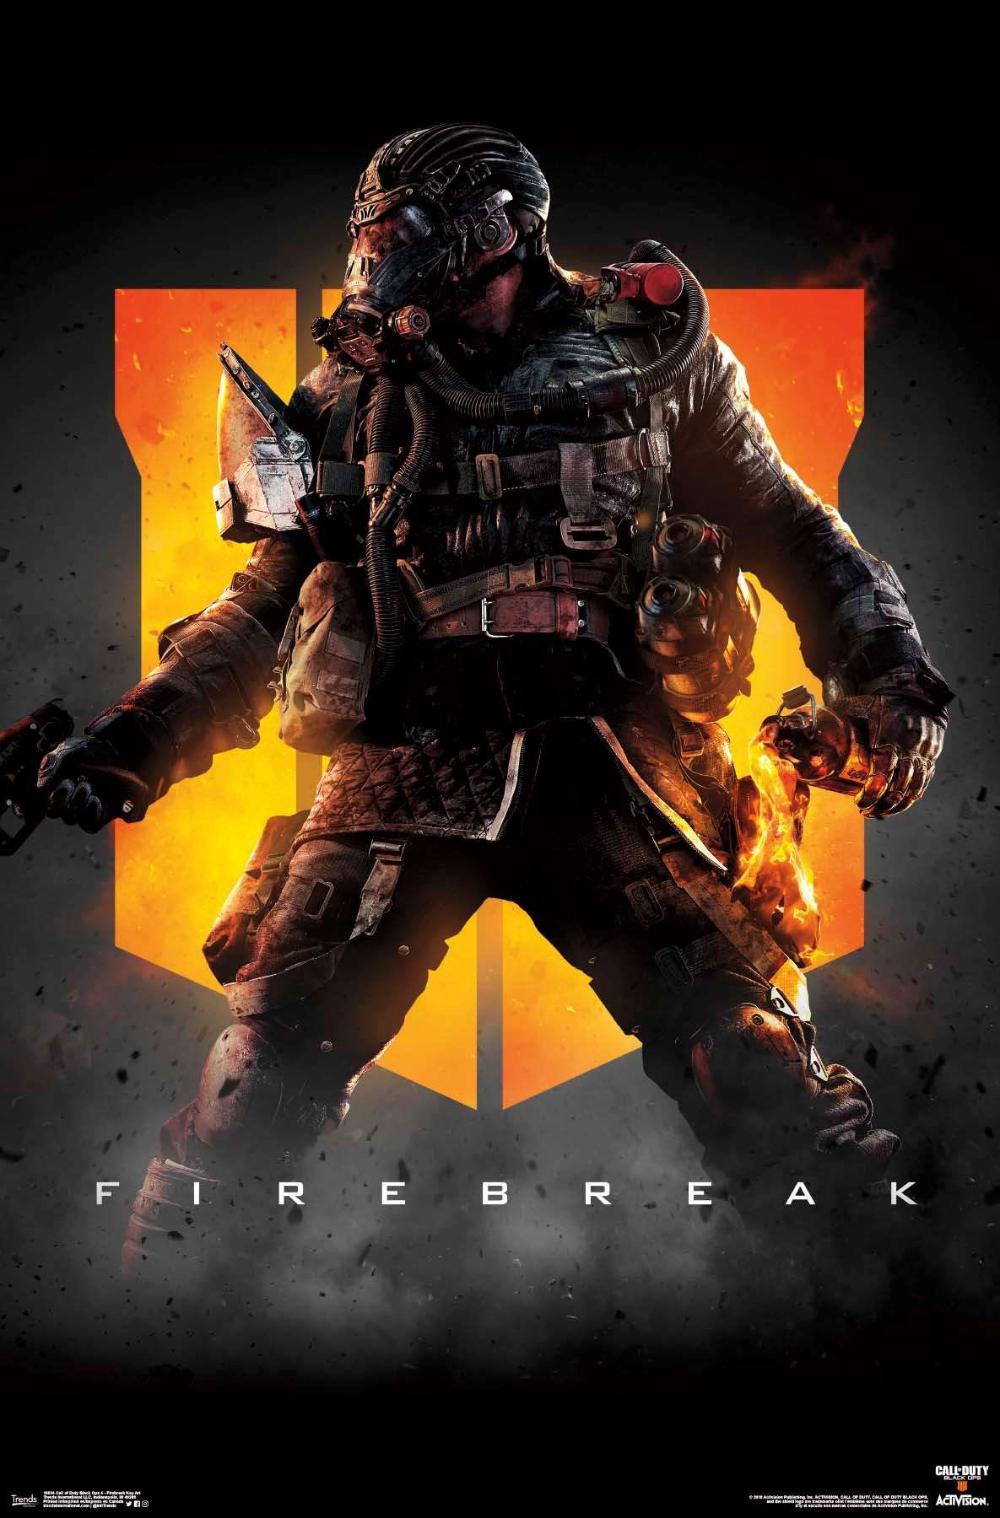 Call Of Duty Black Ops 4 Firebreak Key Art Call Of Duty Black Ops 3 Keys Art Black Ops 4